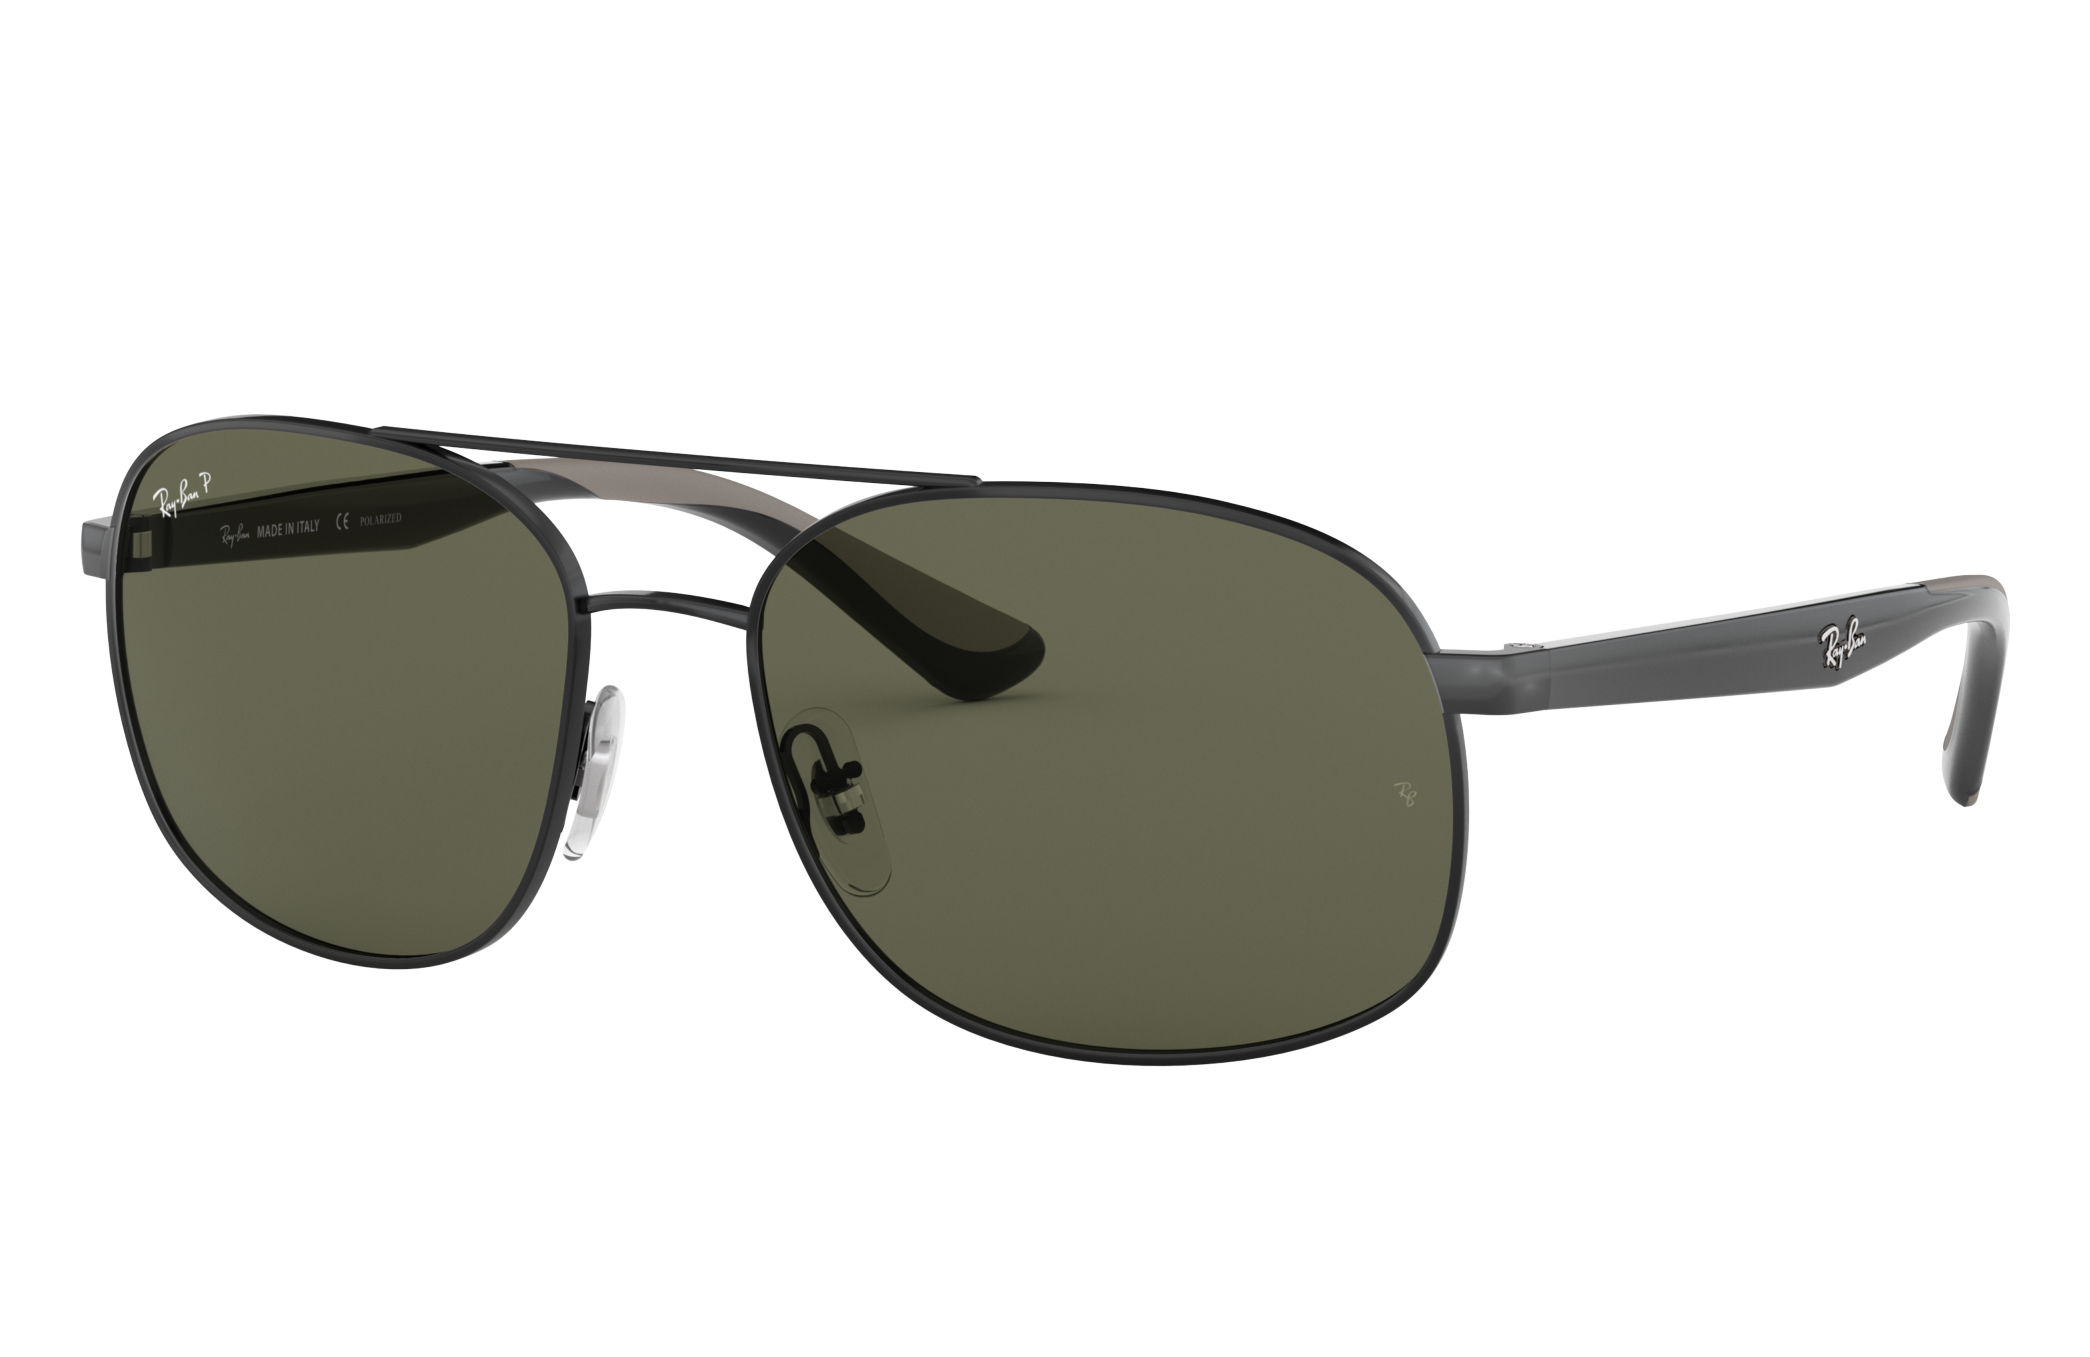 Ray-Ban Rb3593 Black, Polarized Green Lenses - RB3593